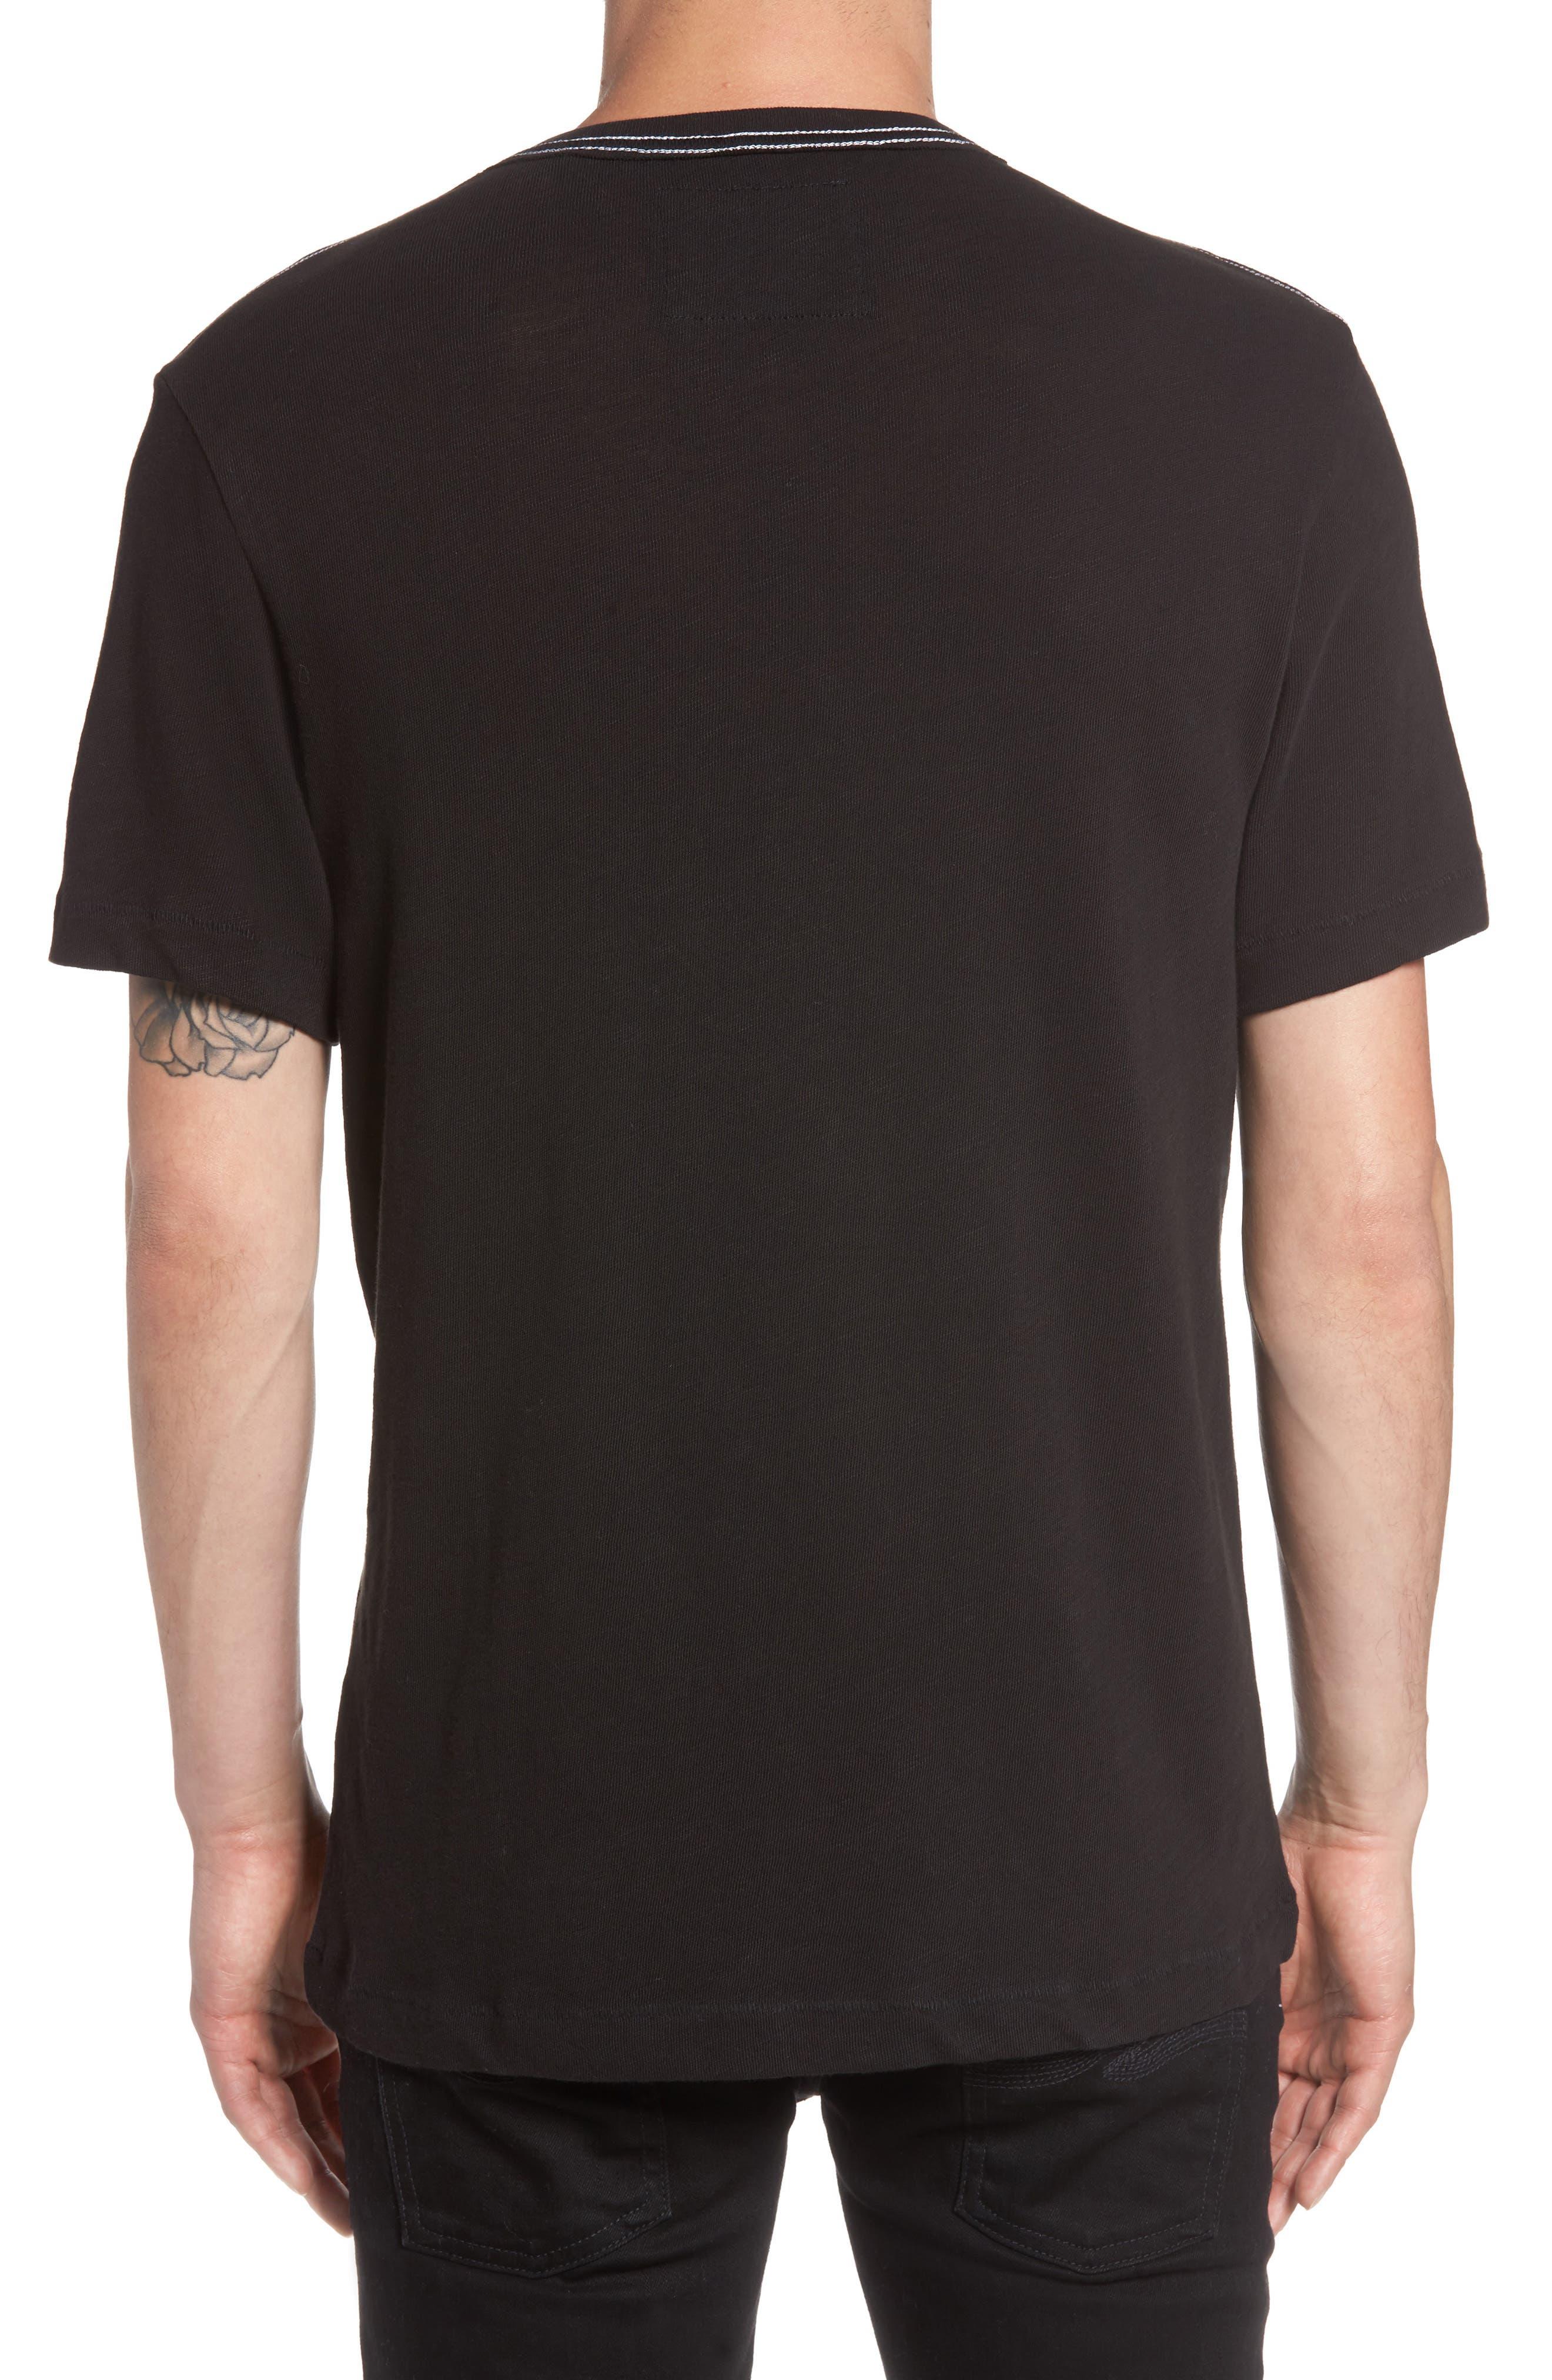 Denim Goods T-Shirt,                             Alternate thumbnail 2, color,                             Black